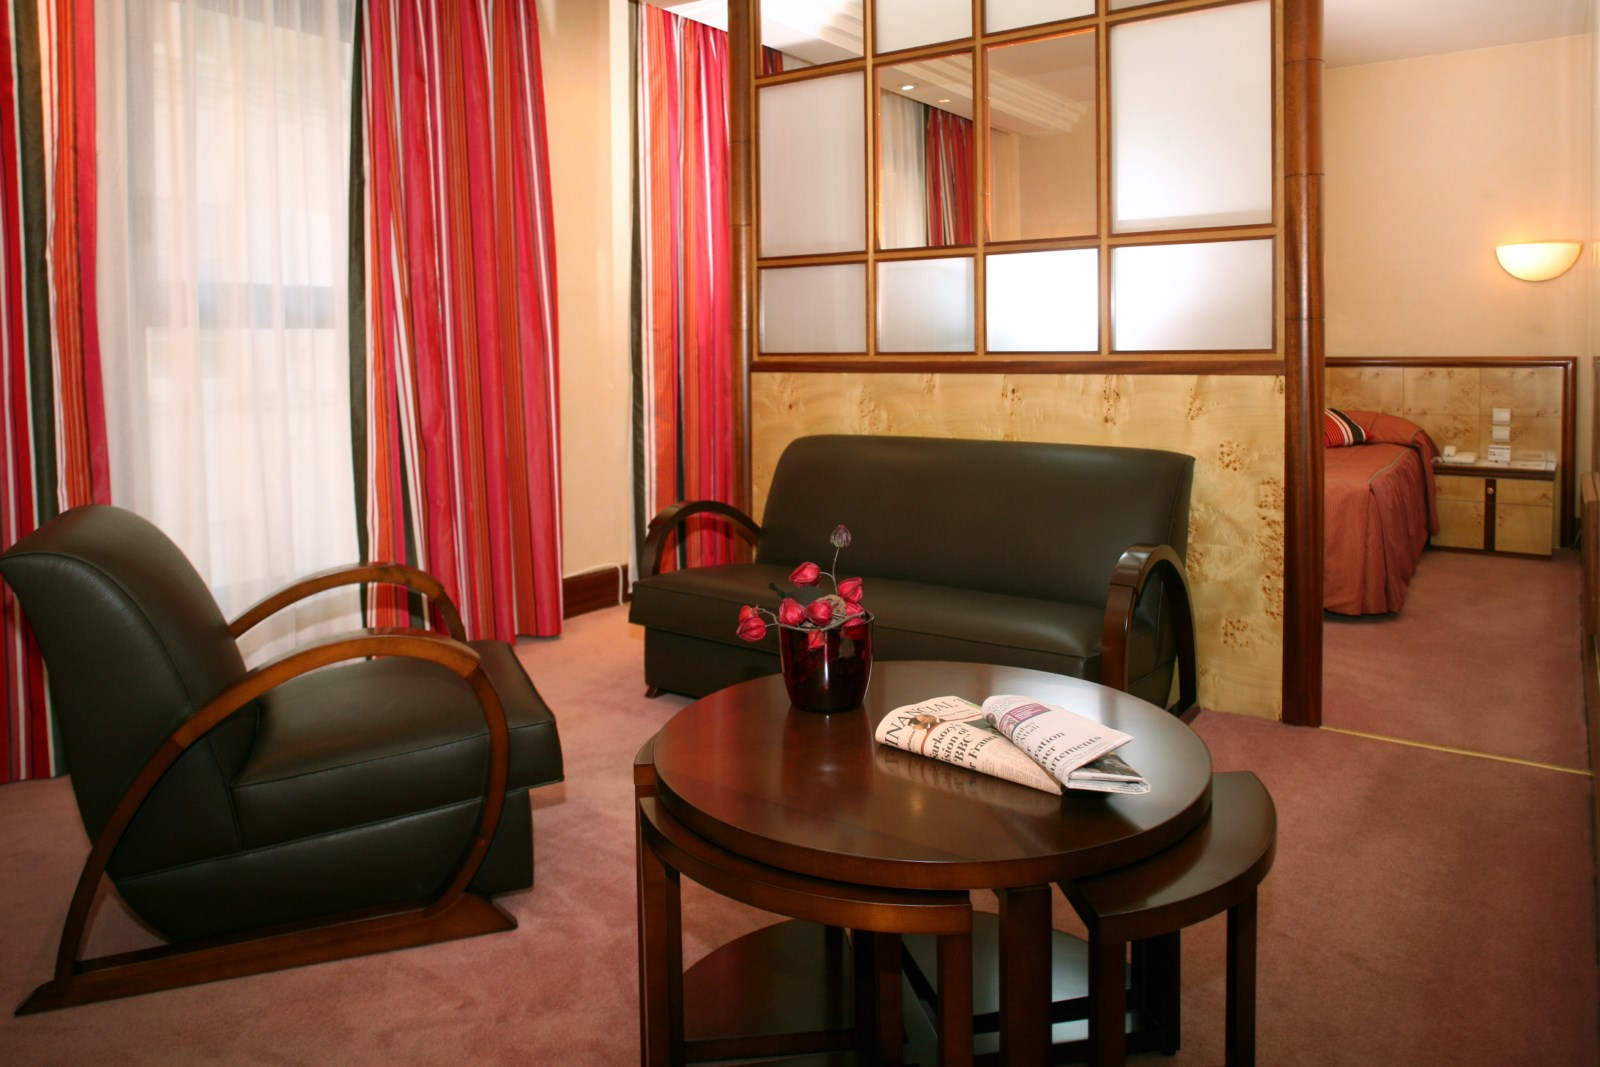 HOTEL  RESTAURANT02 [1600x1200].jpg